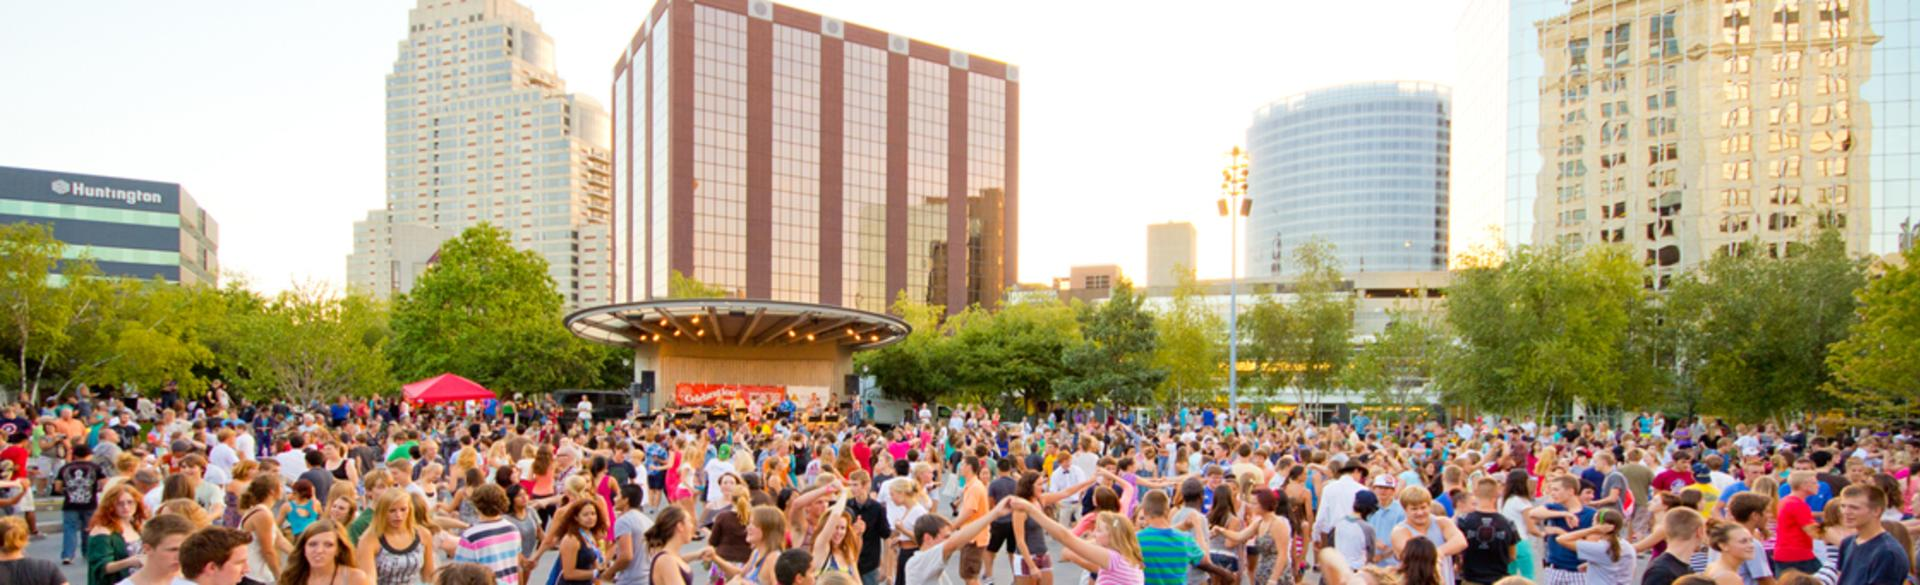 Swing dancing in downtown Grand Rapids